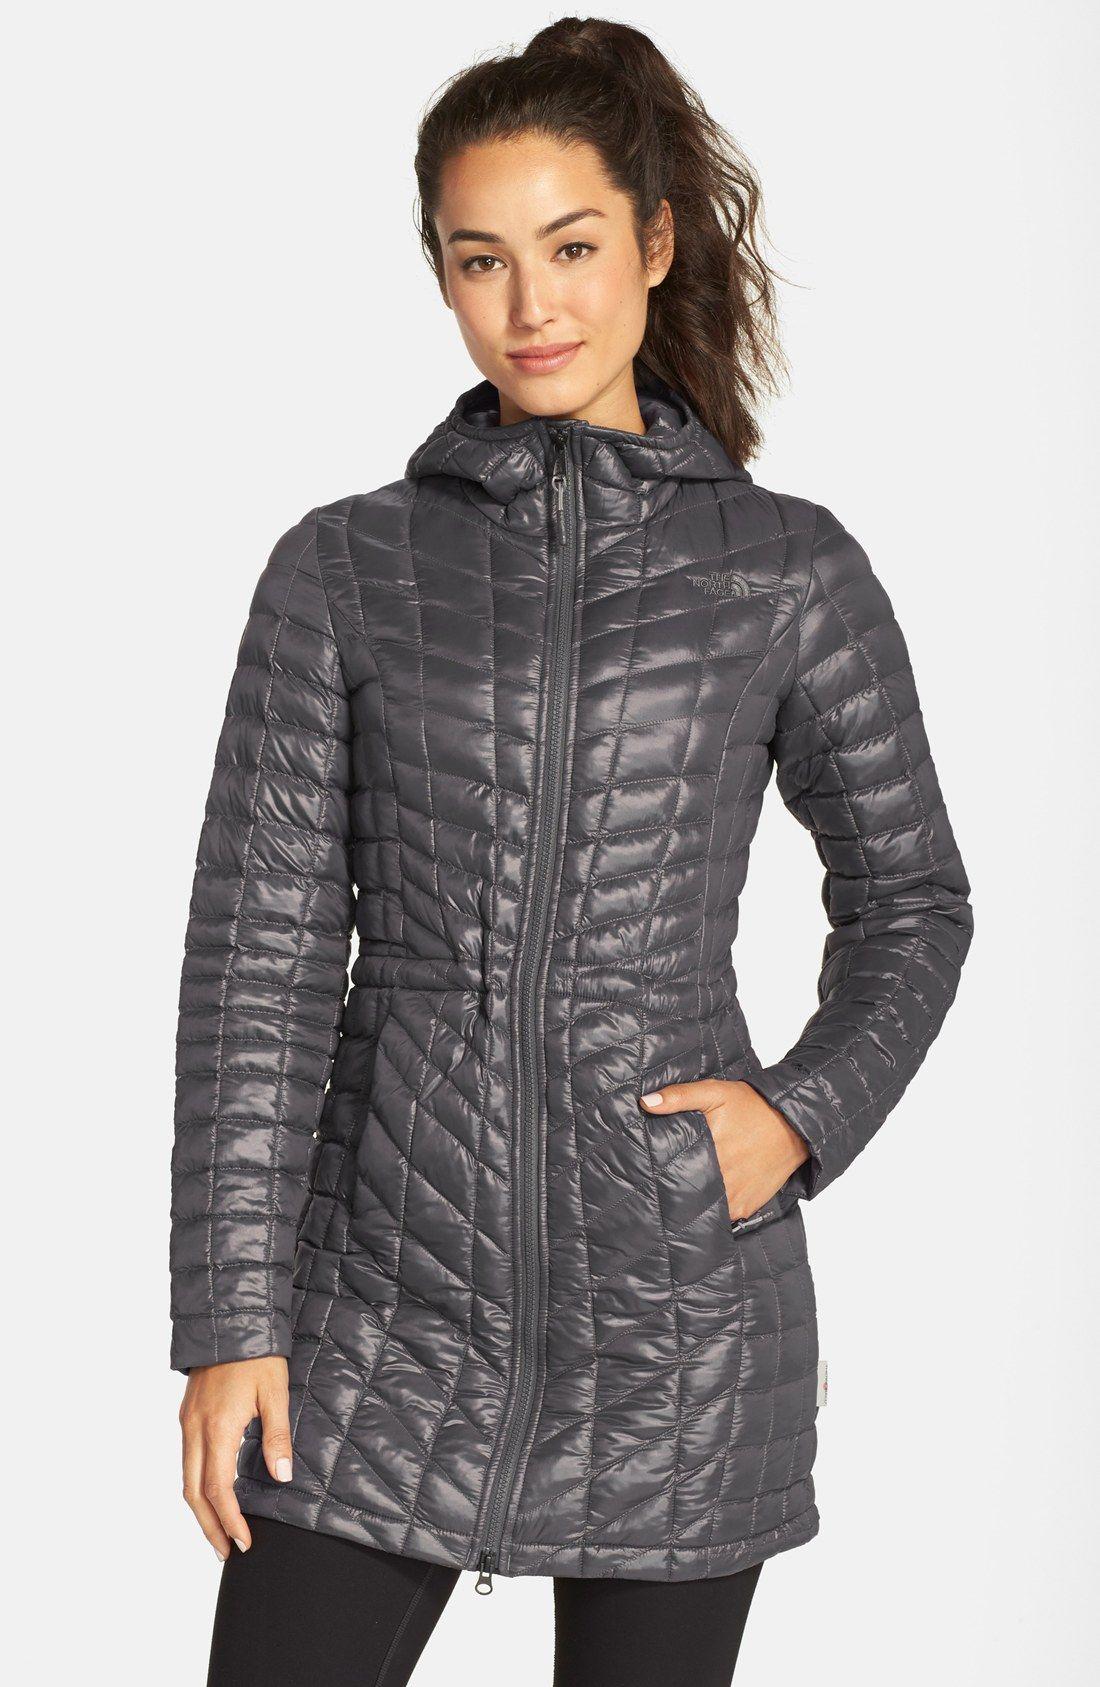 Pin On Jacket Ponchos Coat For Women [ 1687 x 1100 Pixel ]